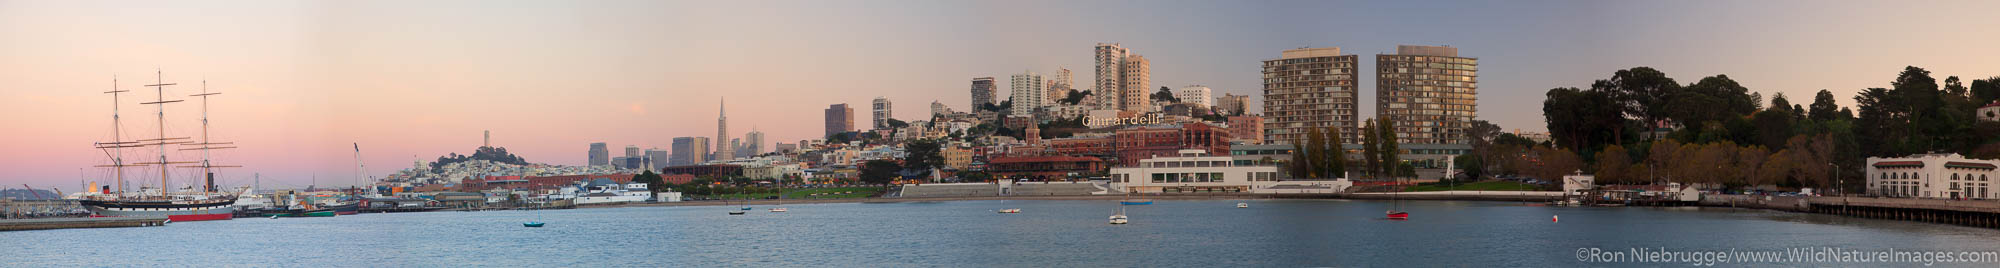 Panoramic view of the San Francisco skyline from across Aquatic Park lagoon, San Francisco, CA